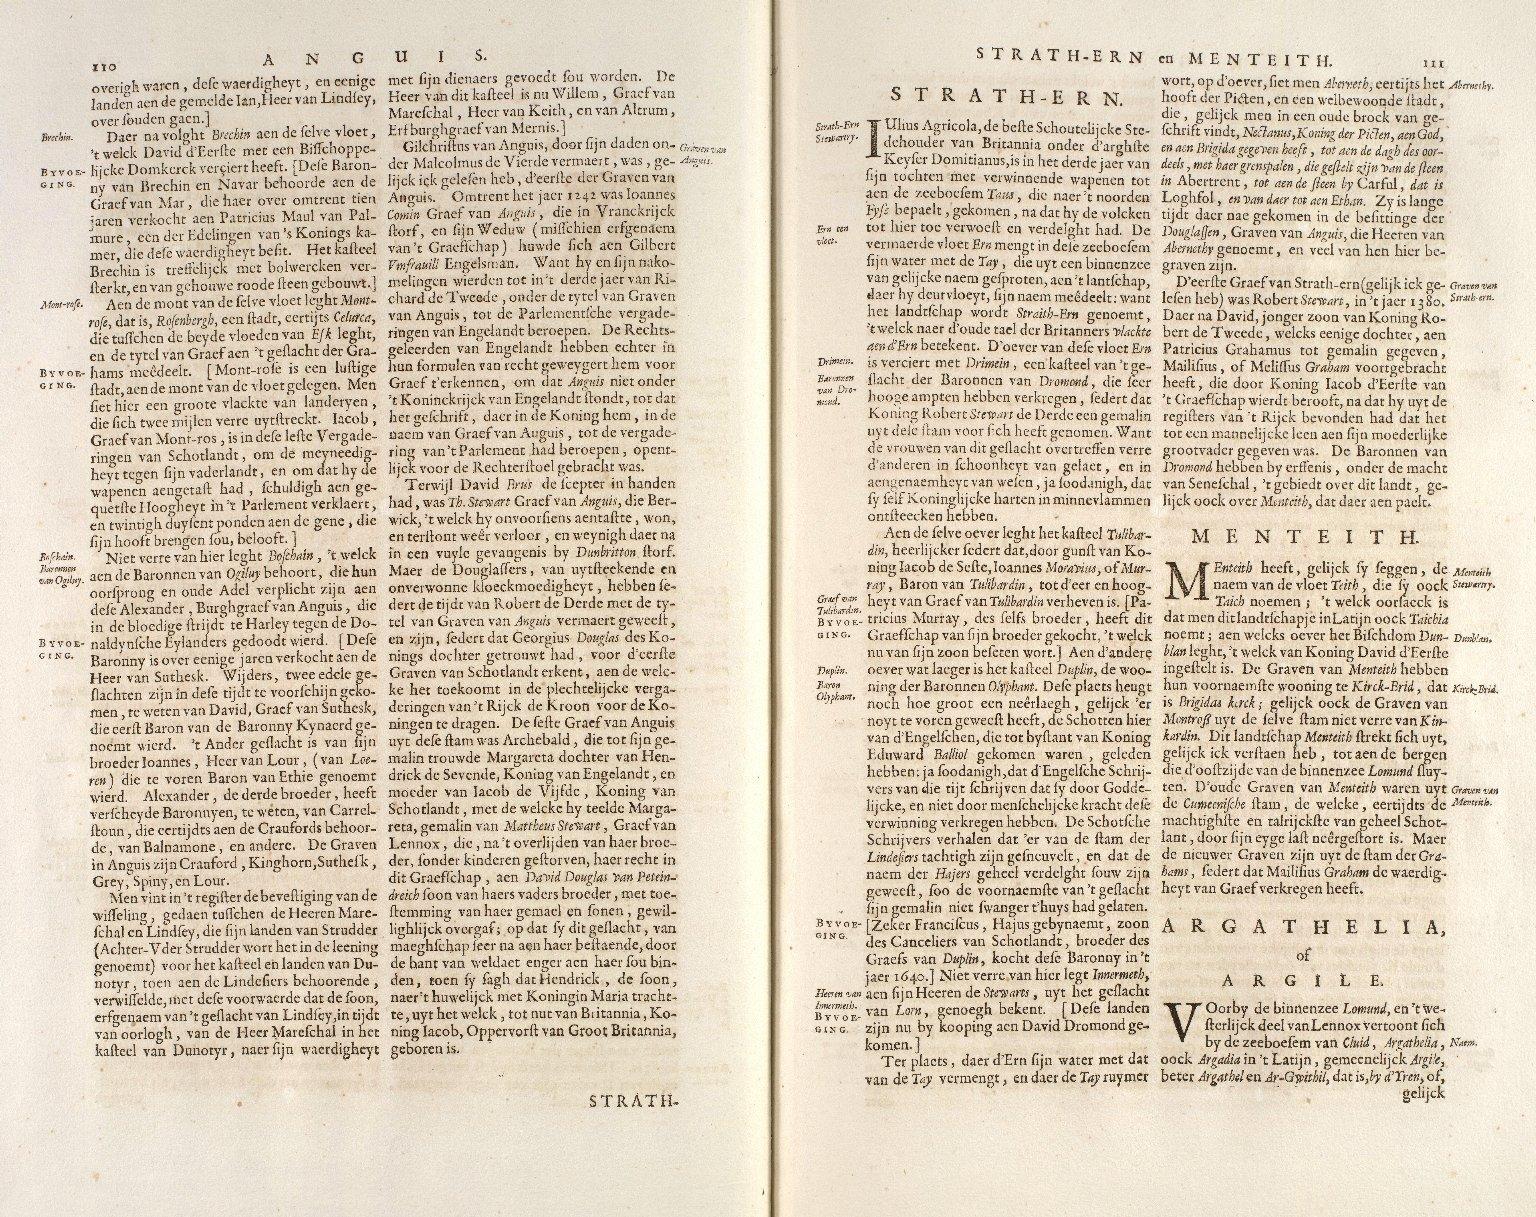 [Geographiae Blavianae] [Also known as: Atlas major] [096 of 153]